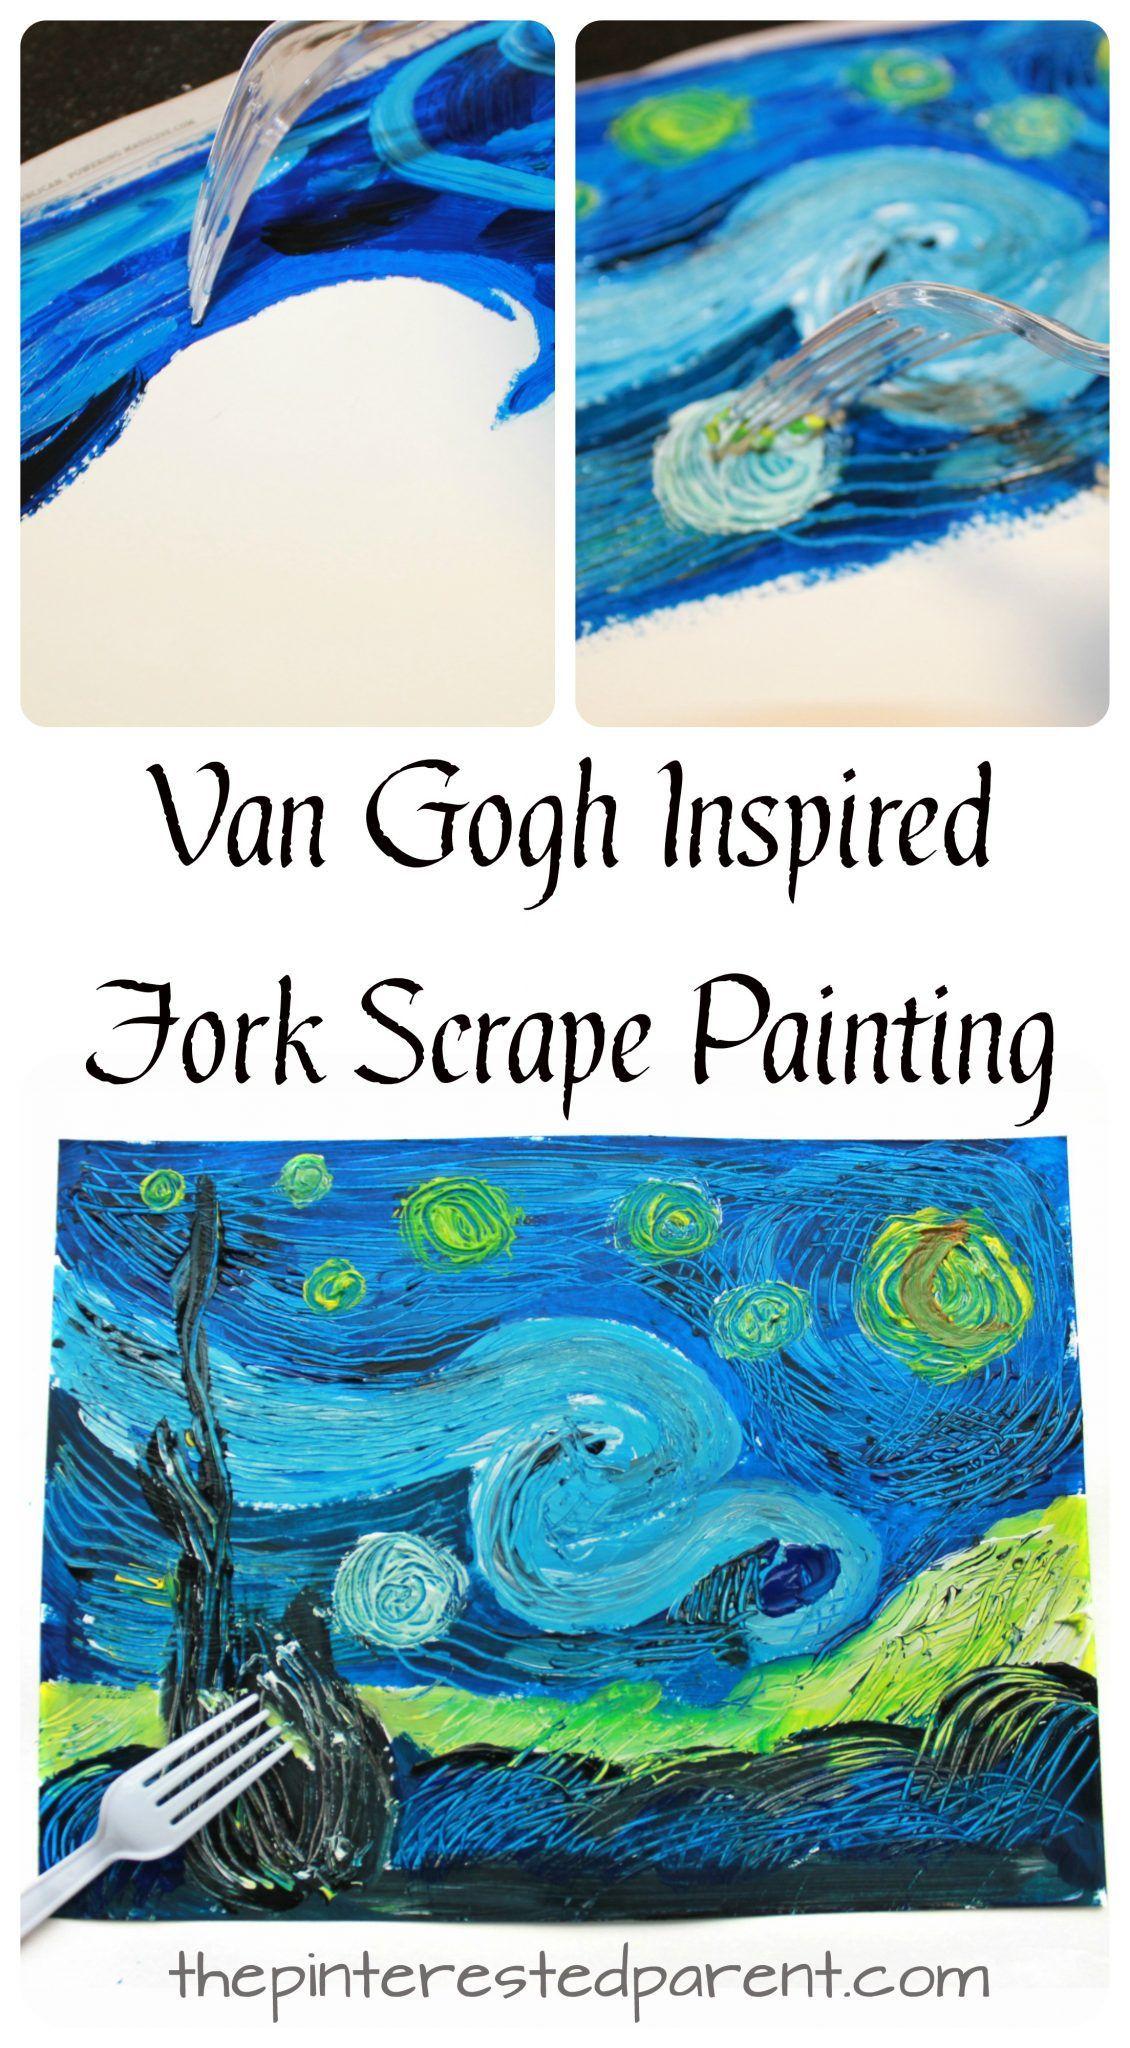 van gogh inspired fork scrape painting in 2018 montessori inspired